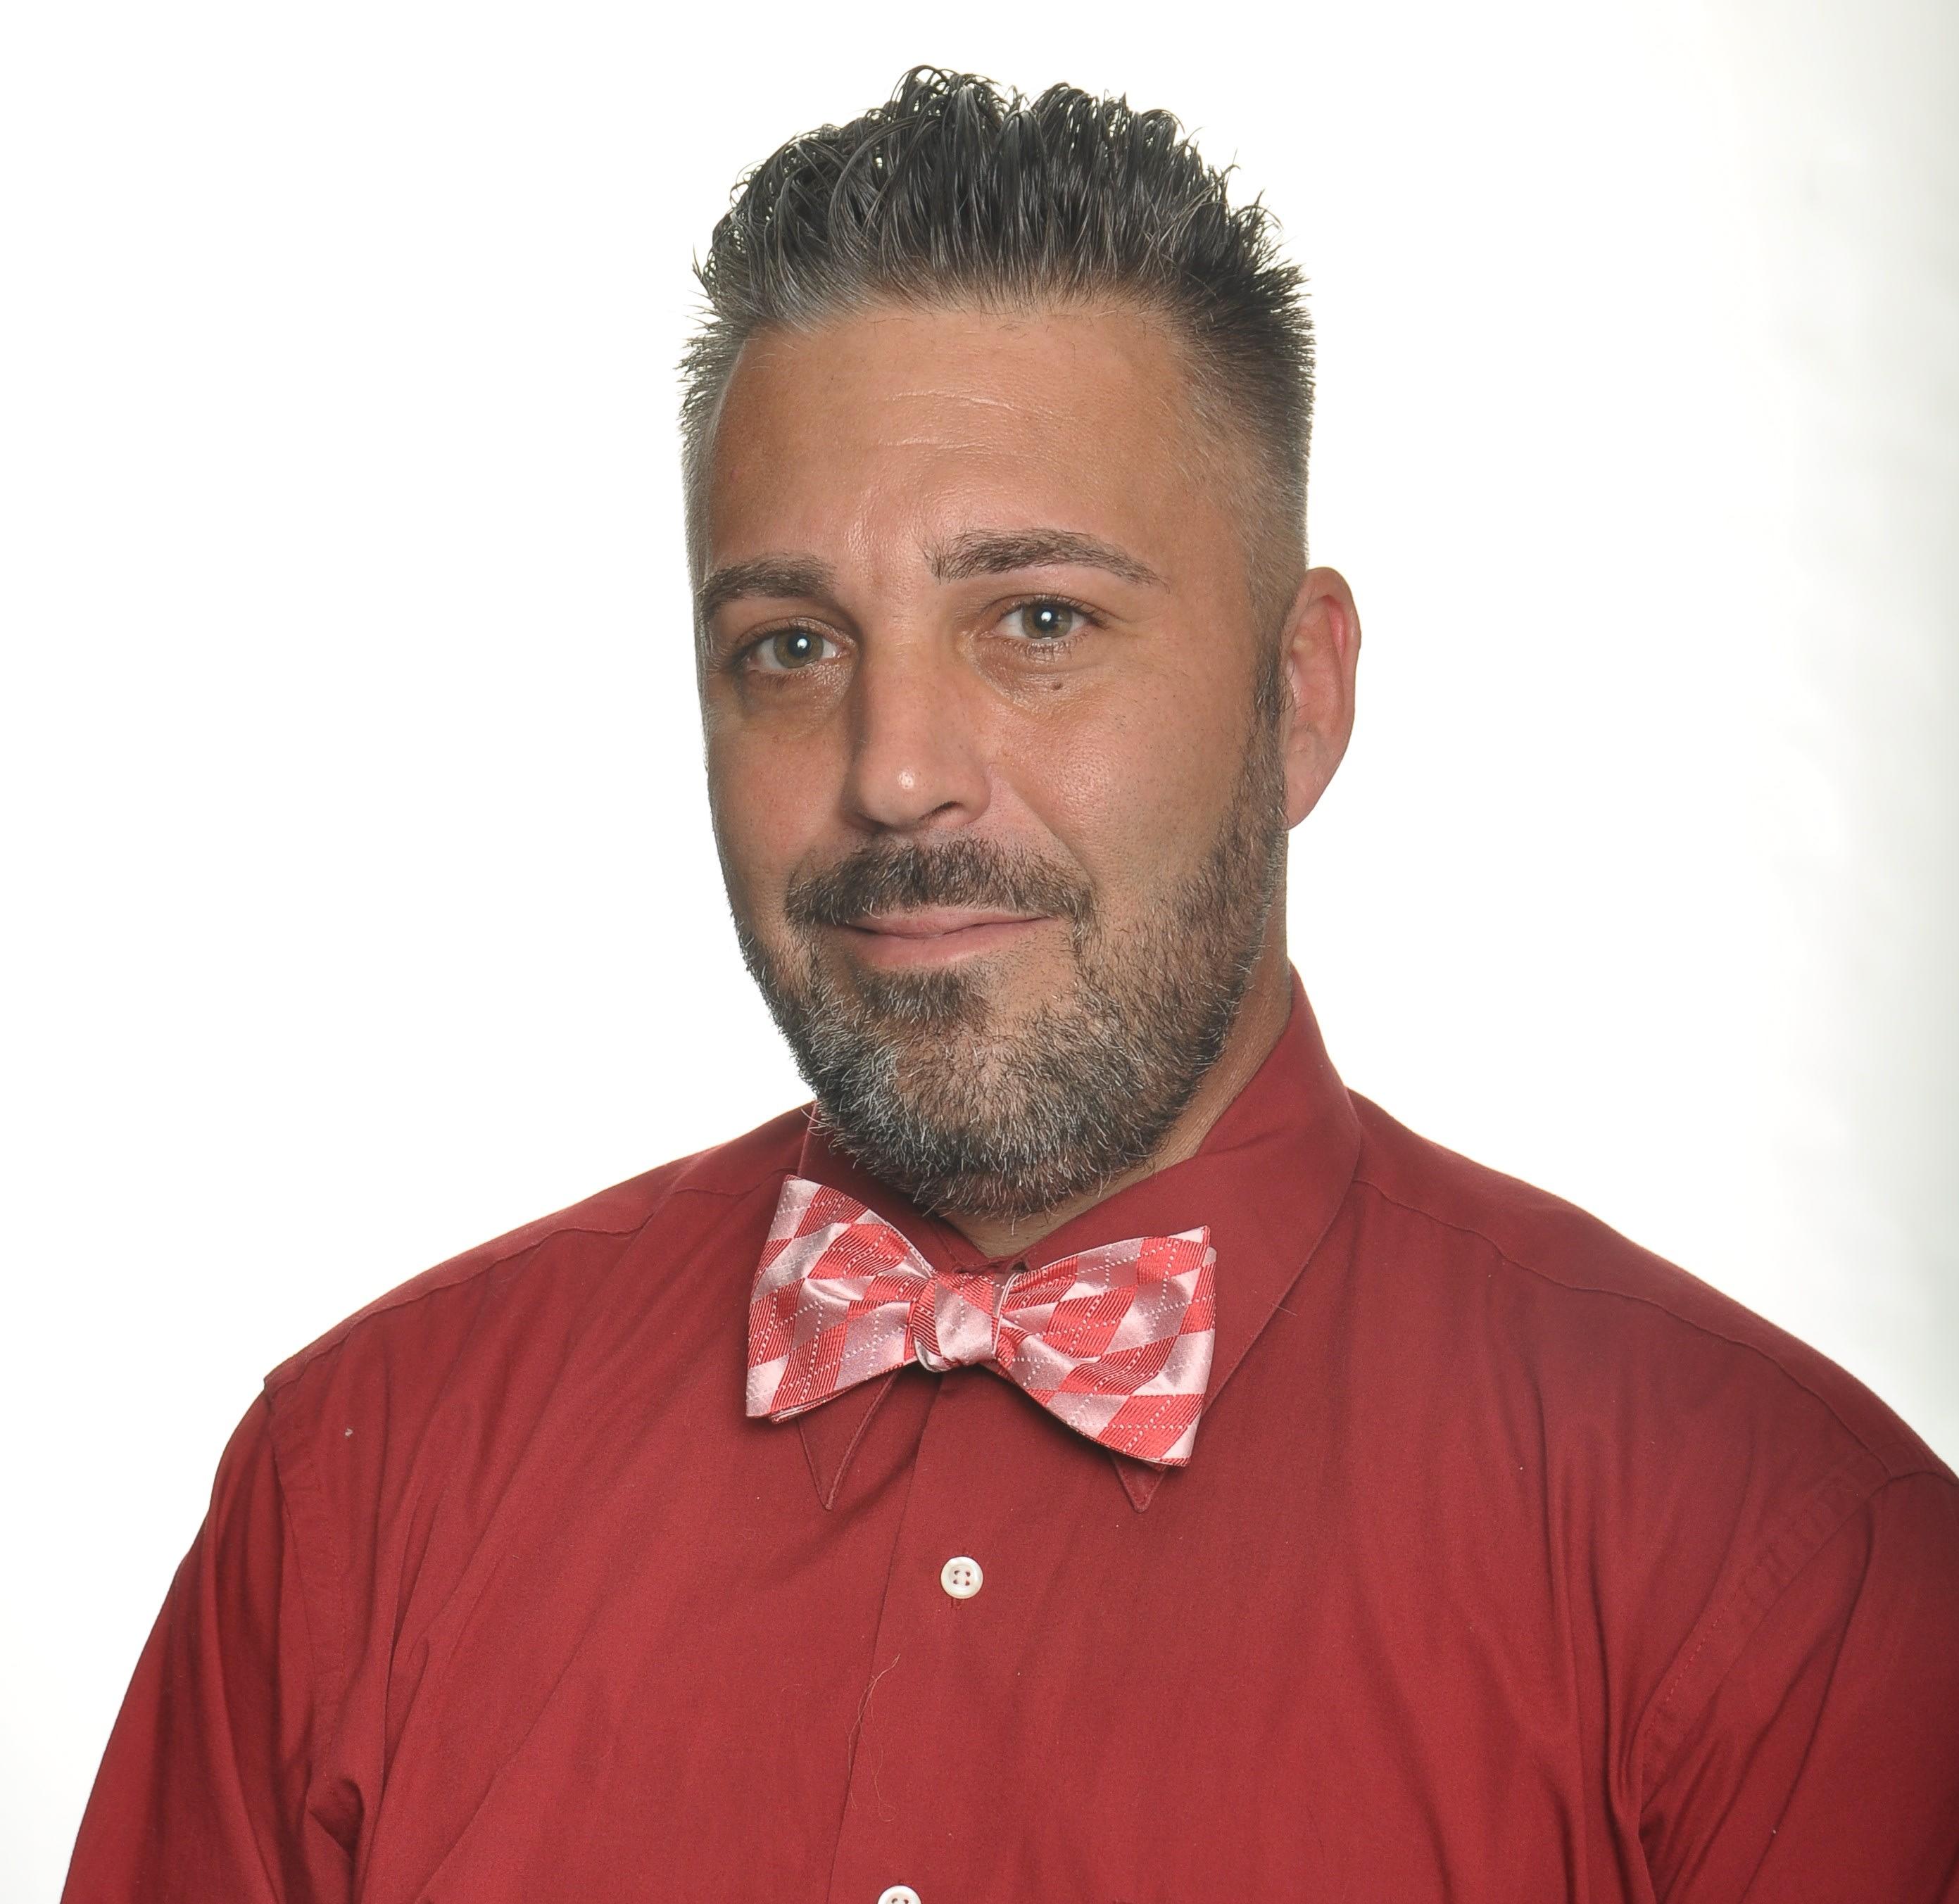 Jason Flory